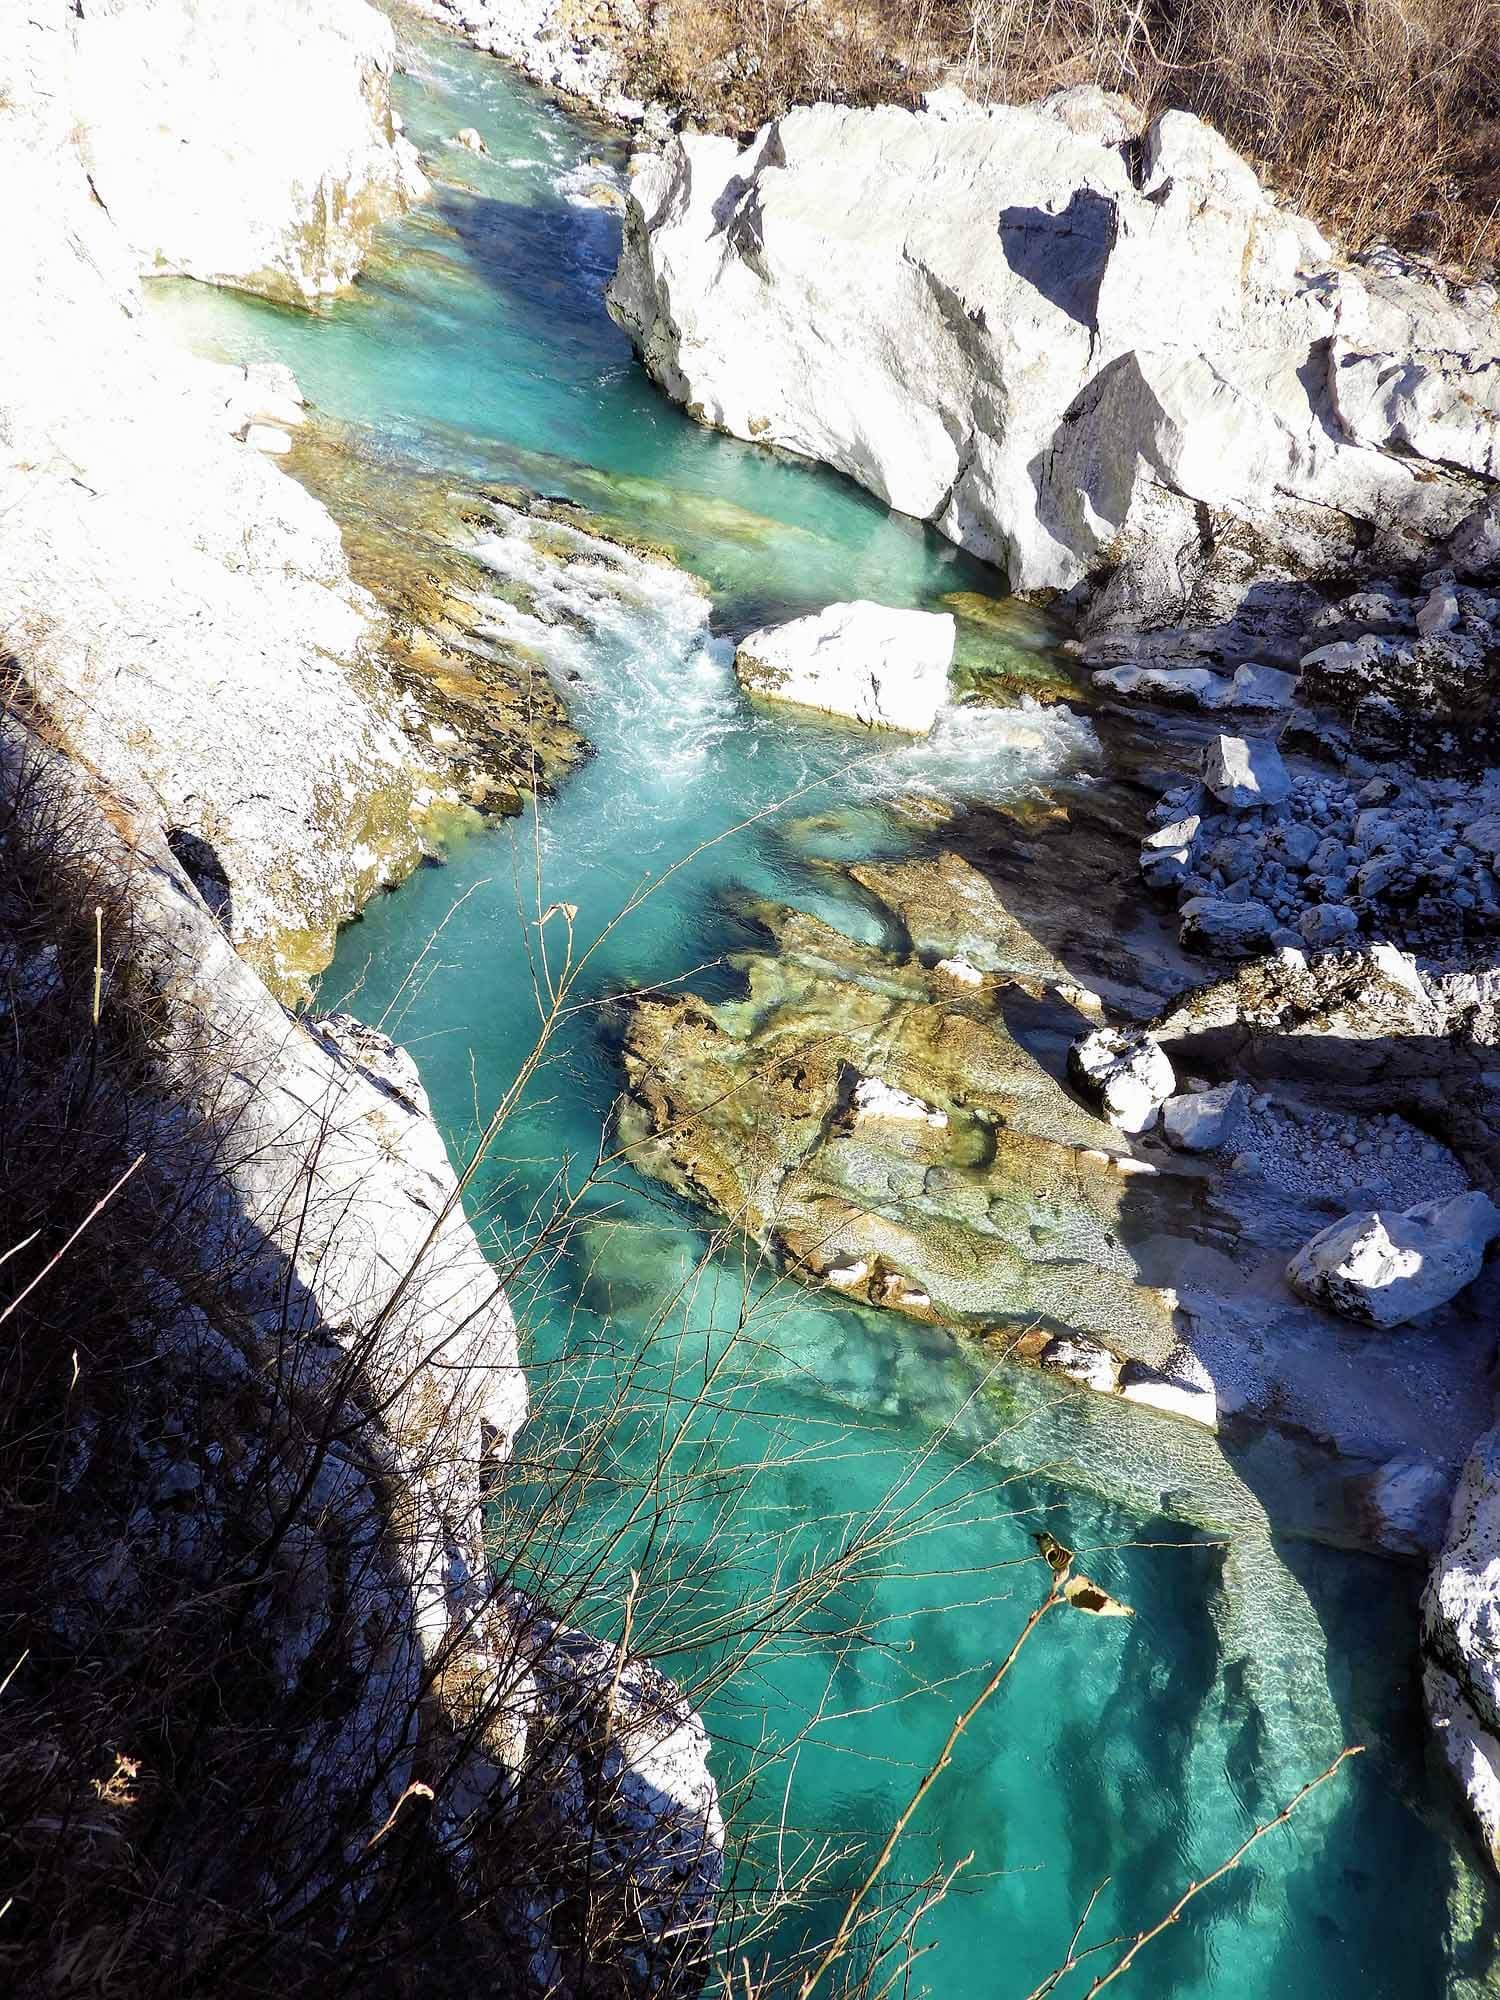 slovenia-triglav-national-park-isonsa-gorge-beautiful-water-turqoise.jpg